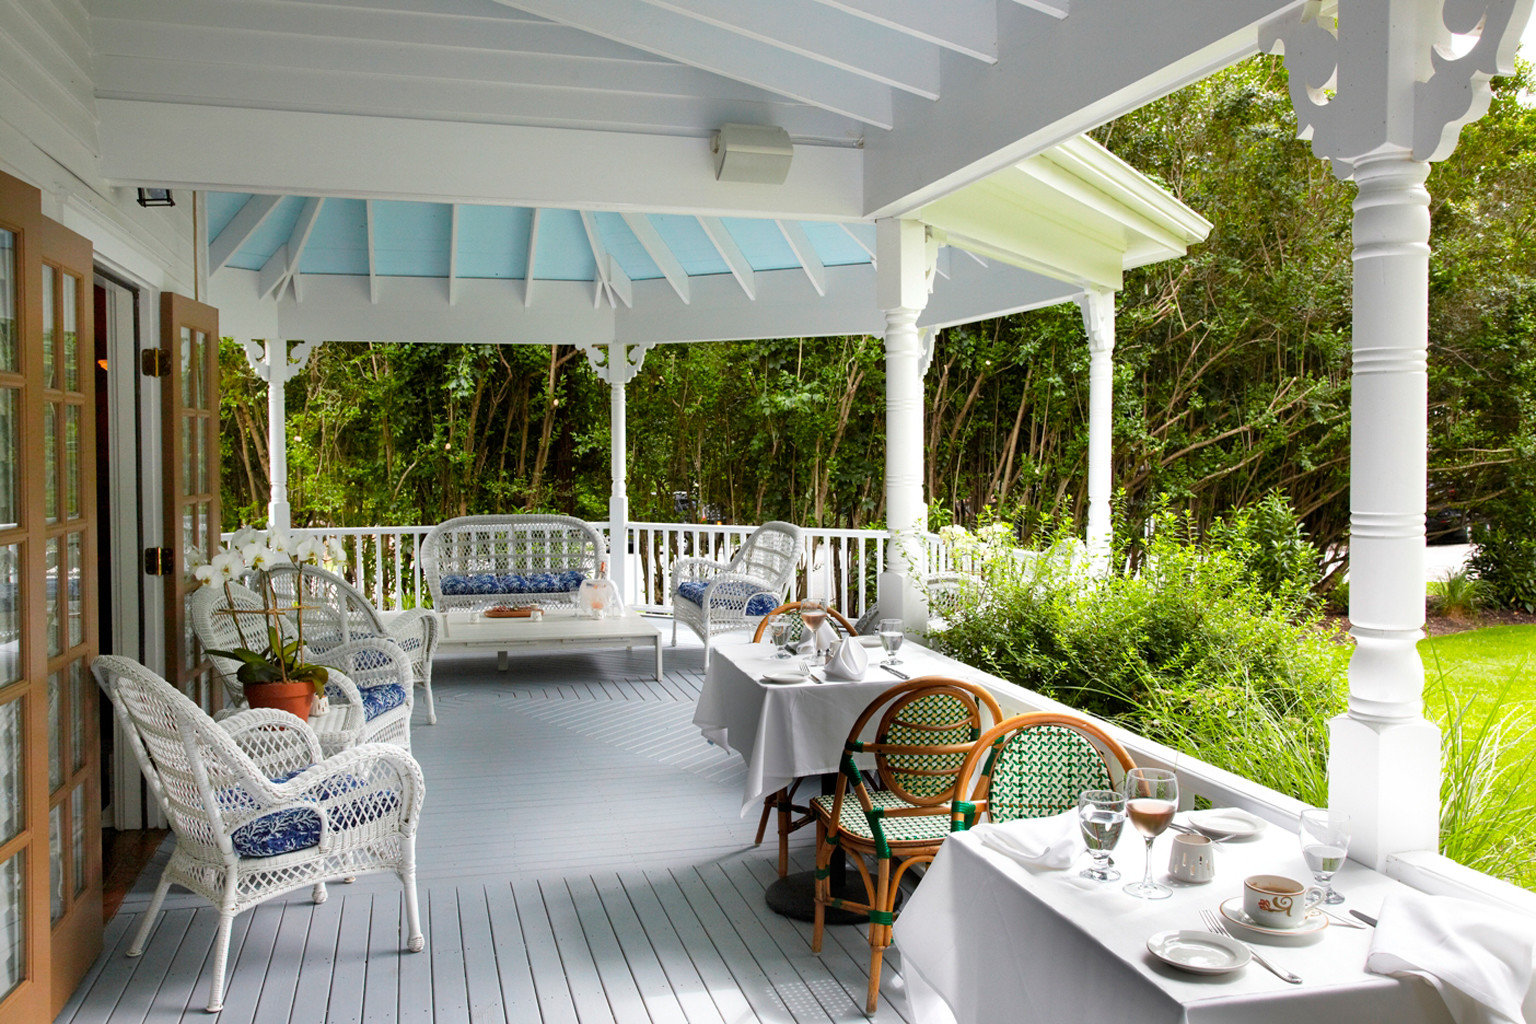 Boutique Classic Country Deck Exterior Grounds Luxury porch property outdoor structure home Villa backyard cottage condominium Patio